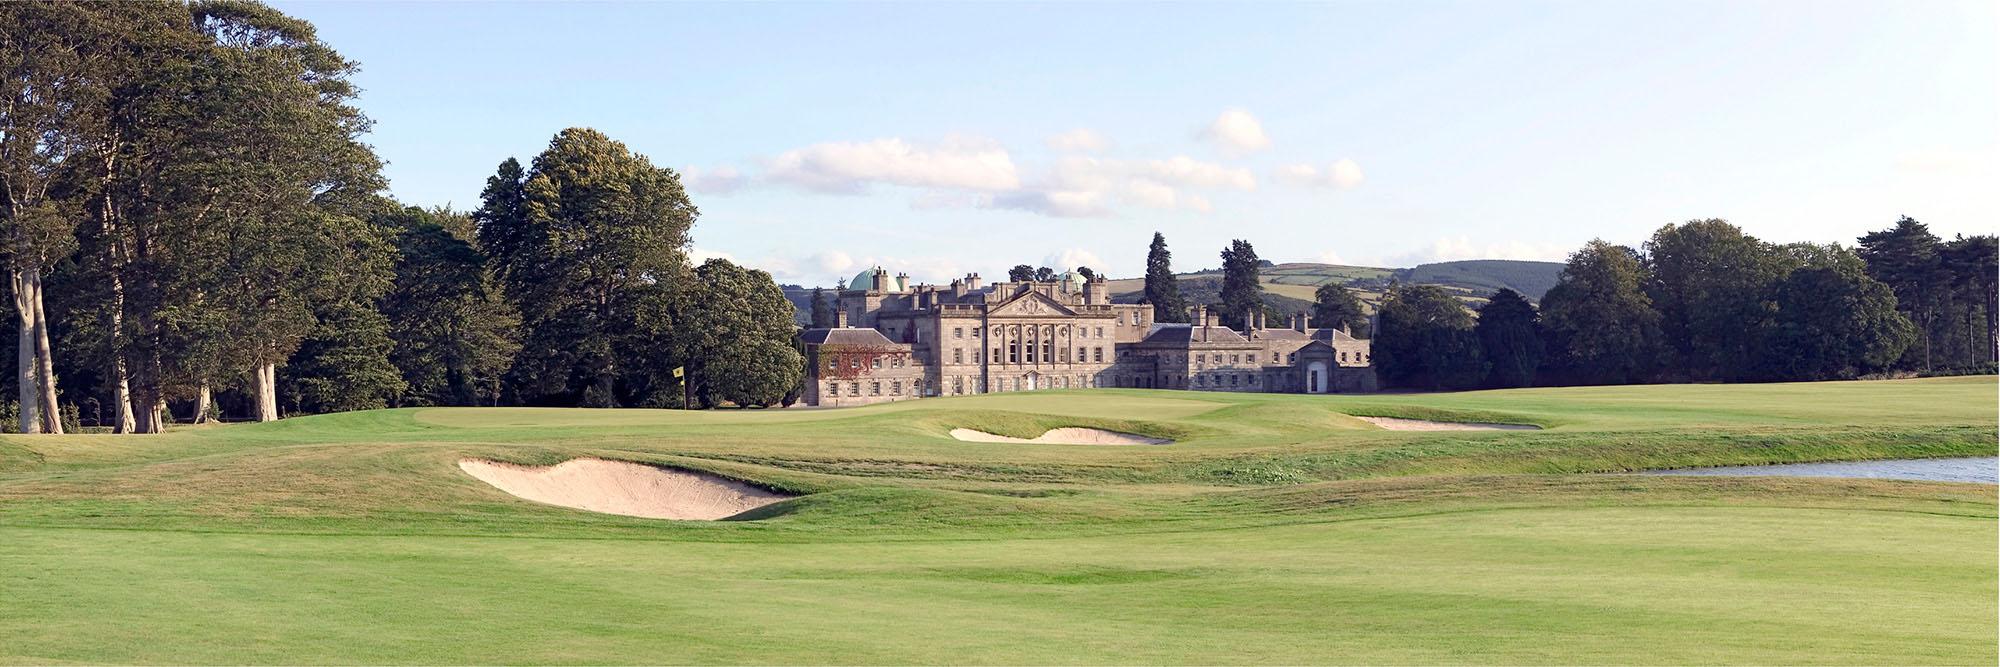 Golf Course Image - Powerscourt No. 18